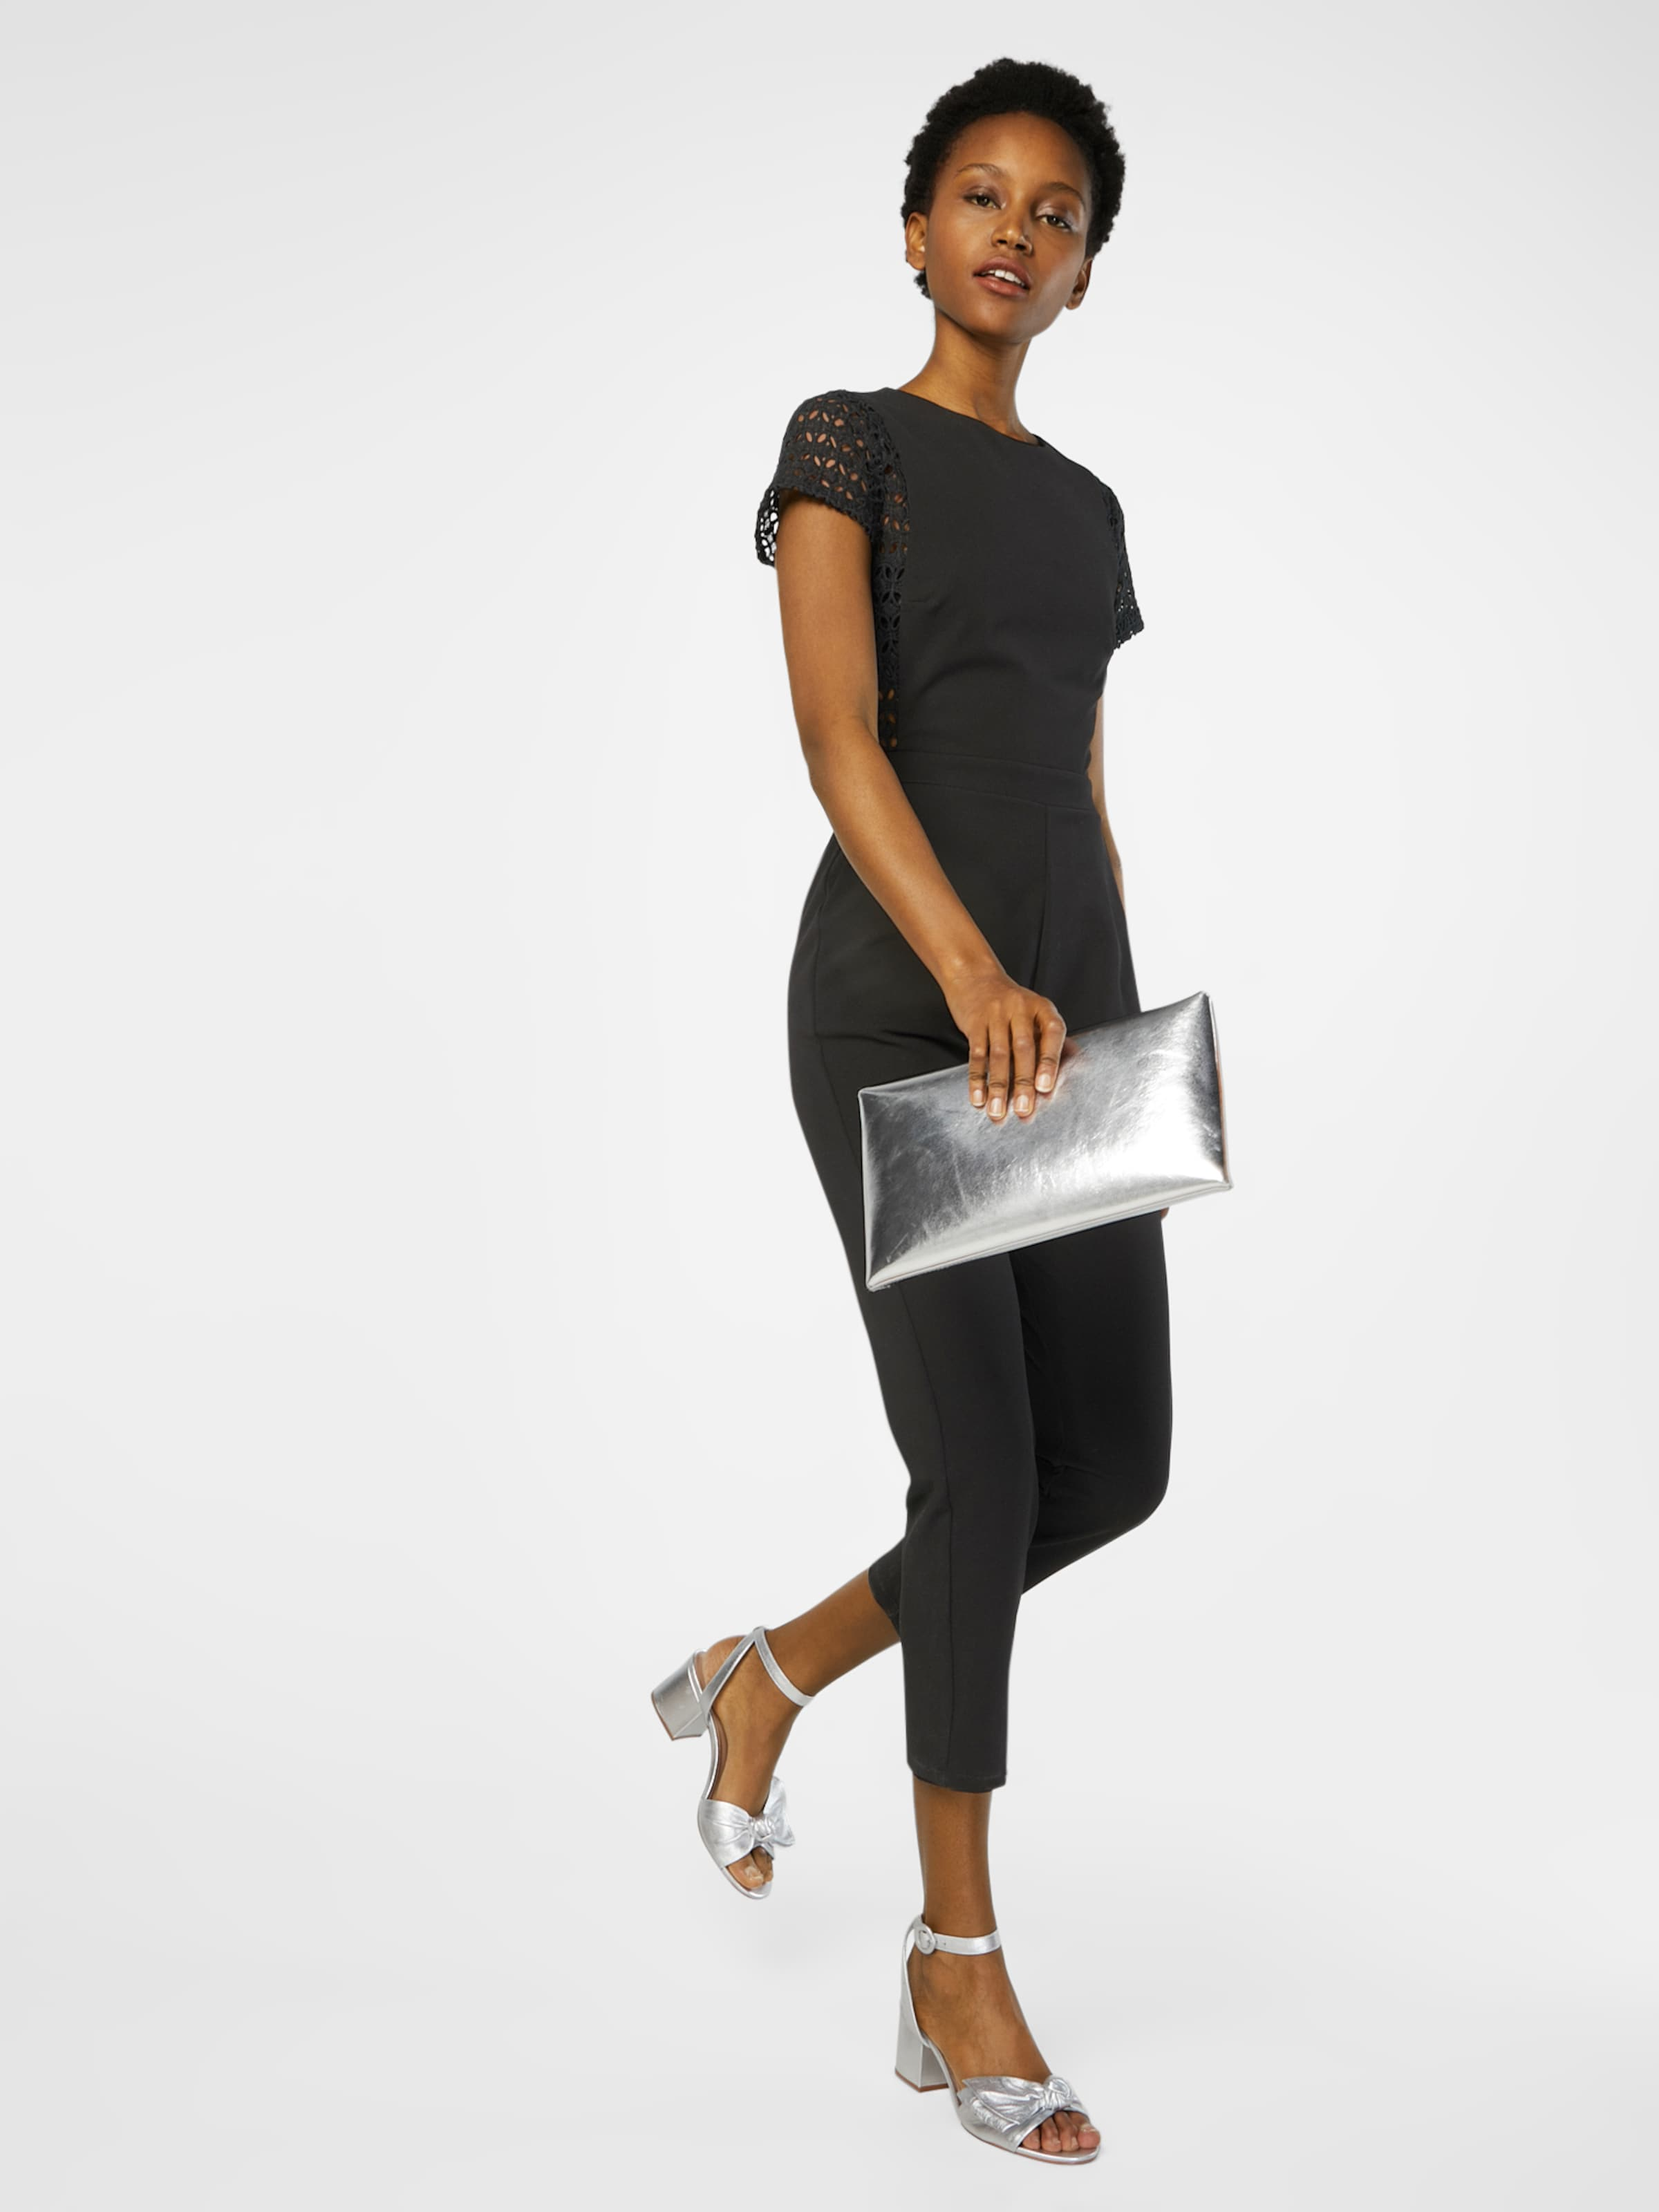 Erkunden Verkauf NEW LOOK Jumpsuit mit Spitzenbesatz xCDvasj4te